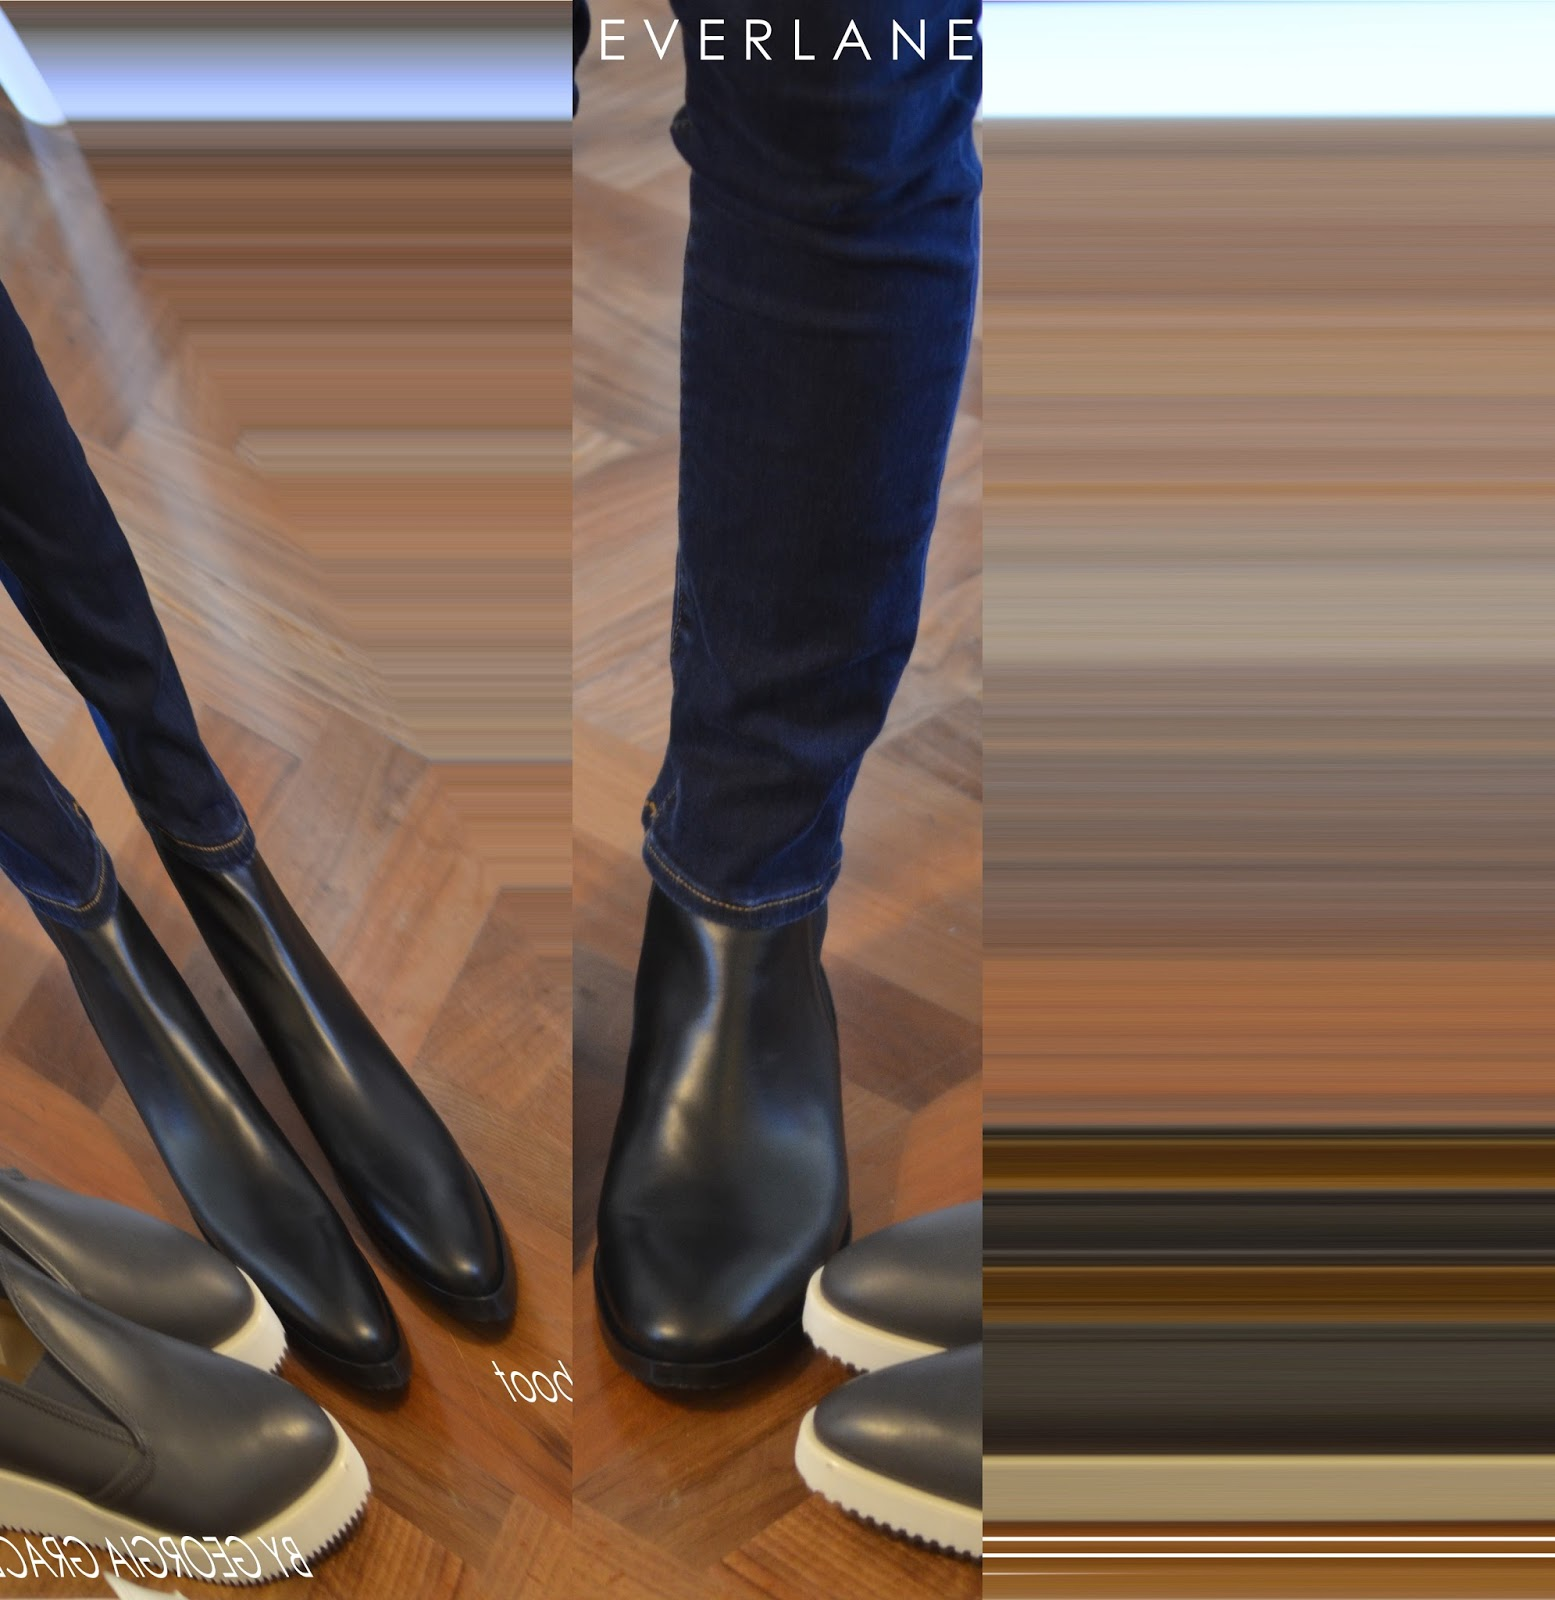 The Leather Street Shoe Everlane